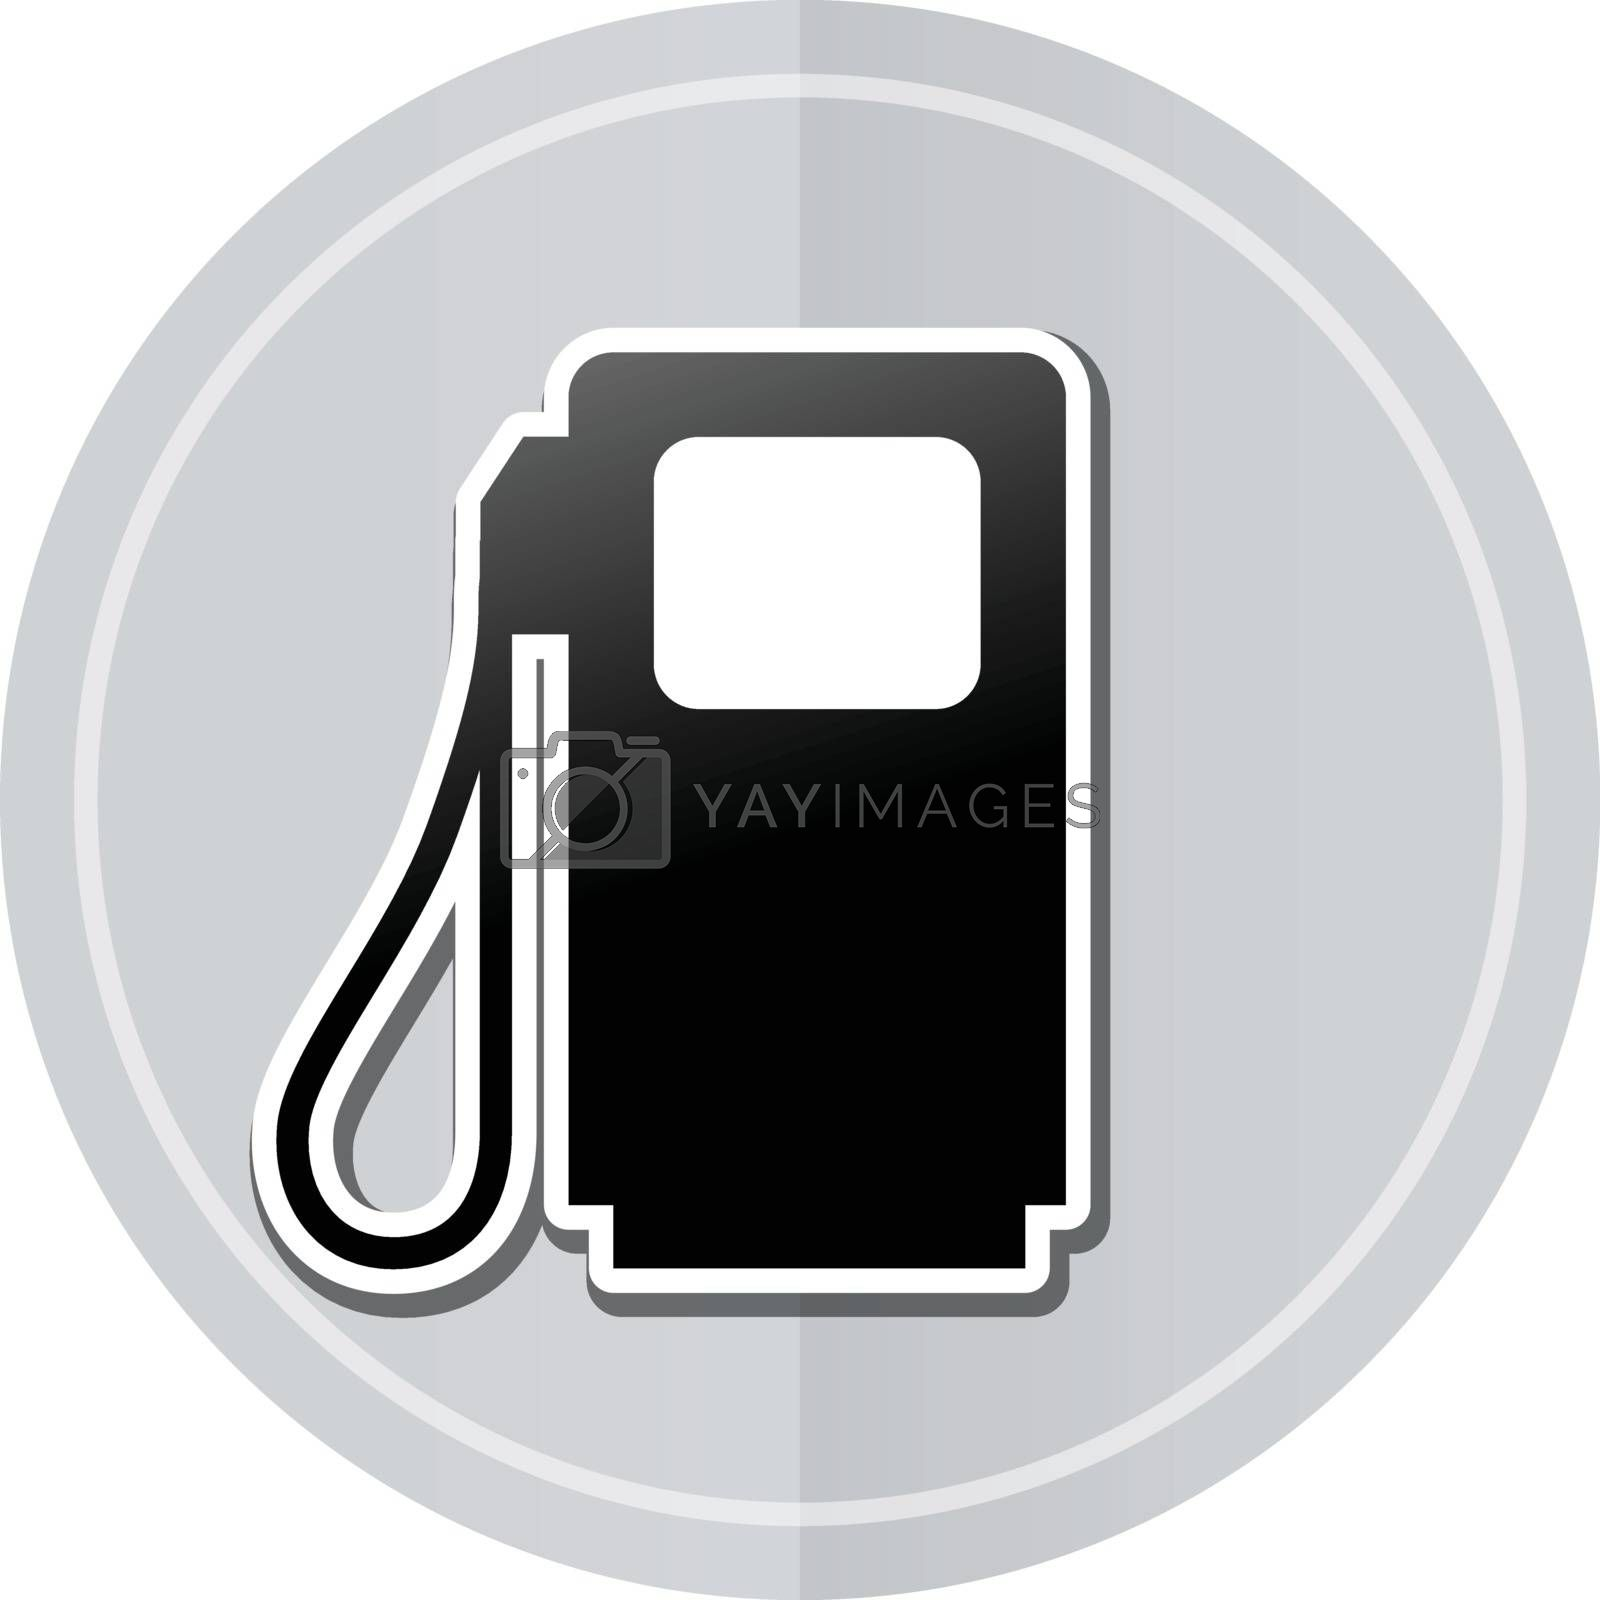 Illustration of pump sticker icon simple design